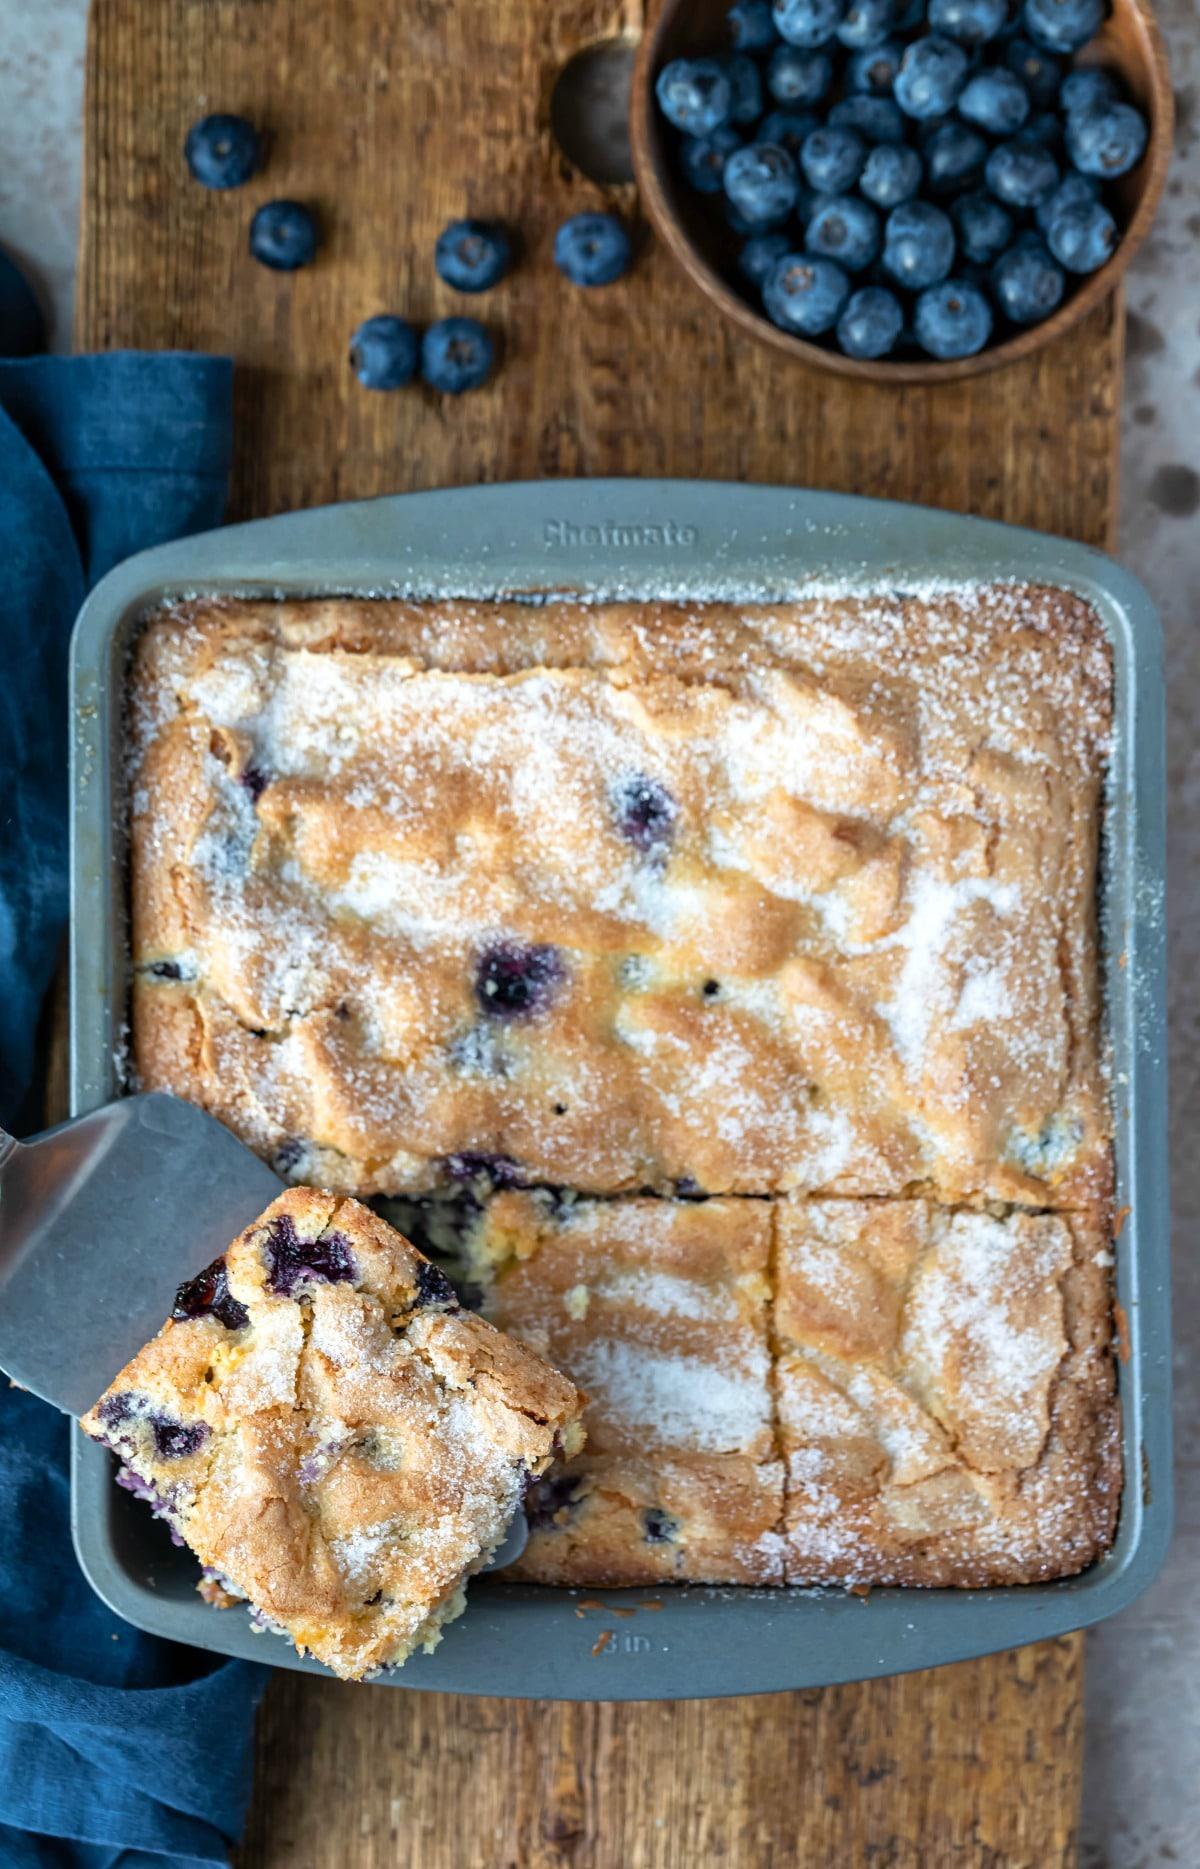 Slice of blueberry cake on a silver spatula